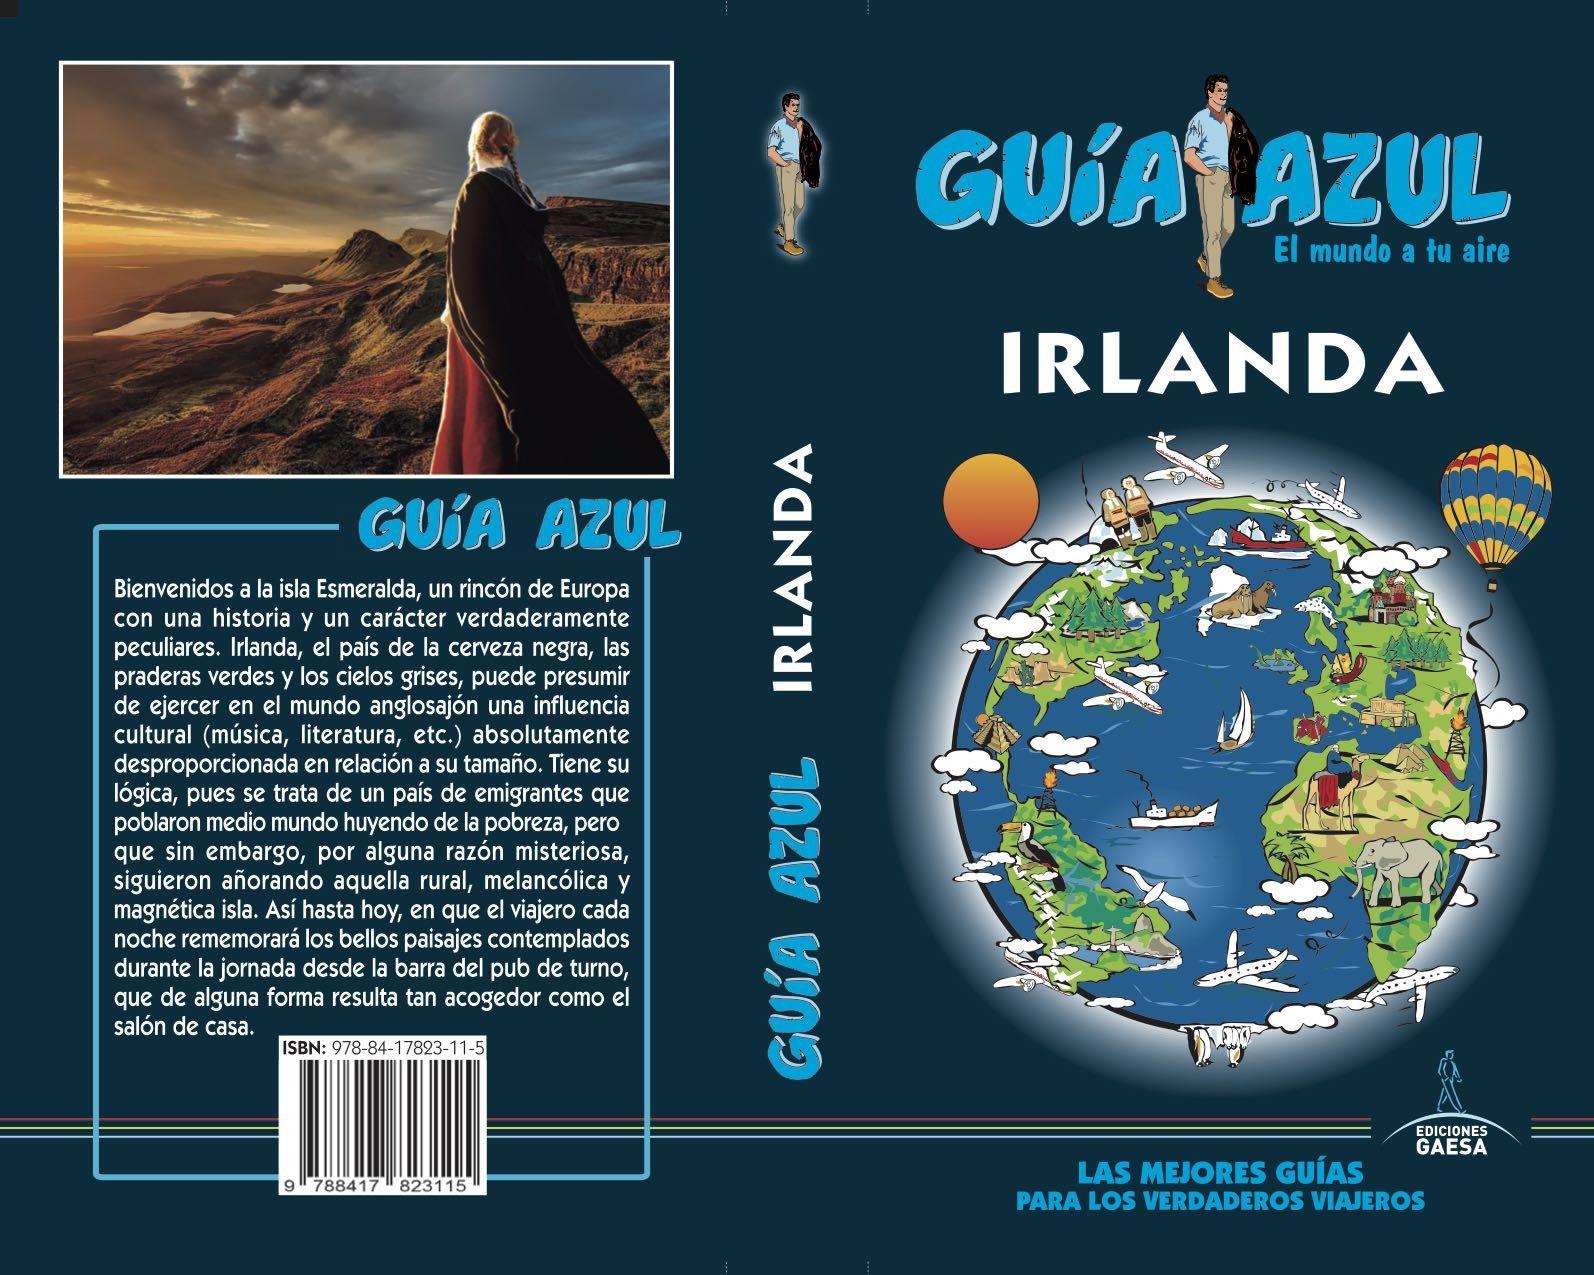 IRLANDA GUIA AZUL